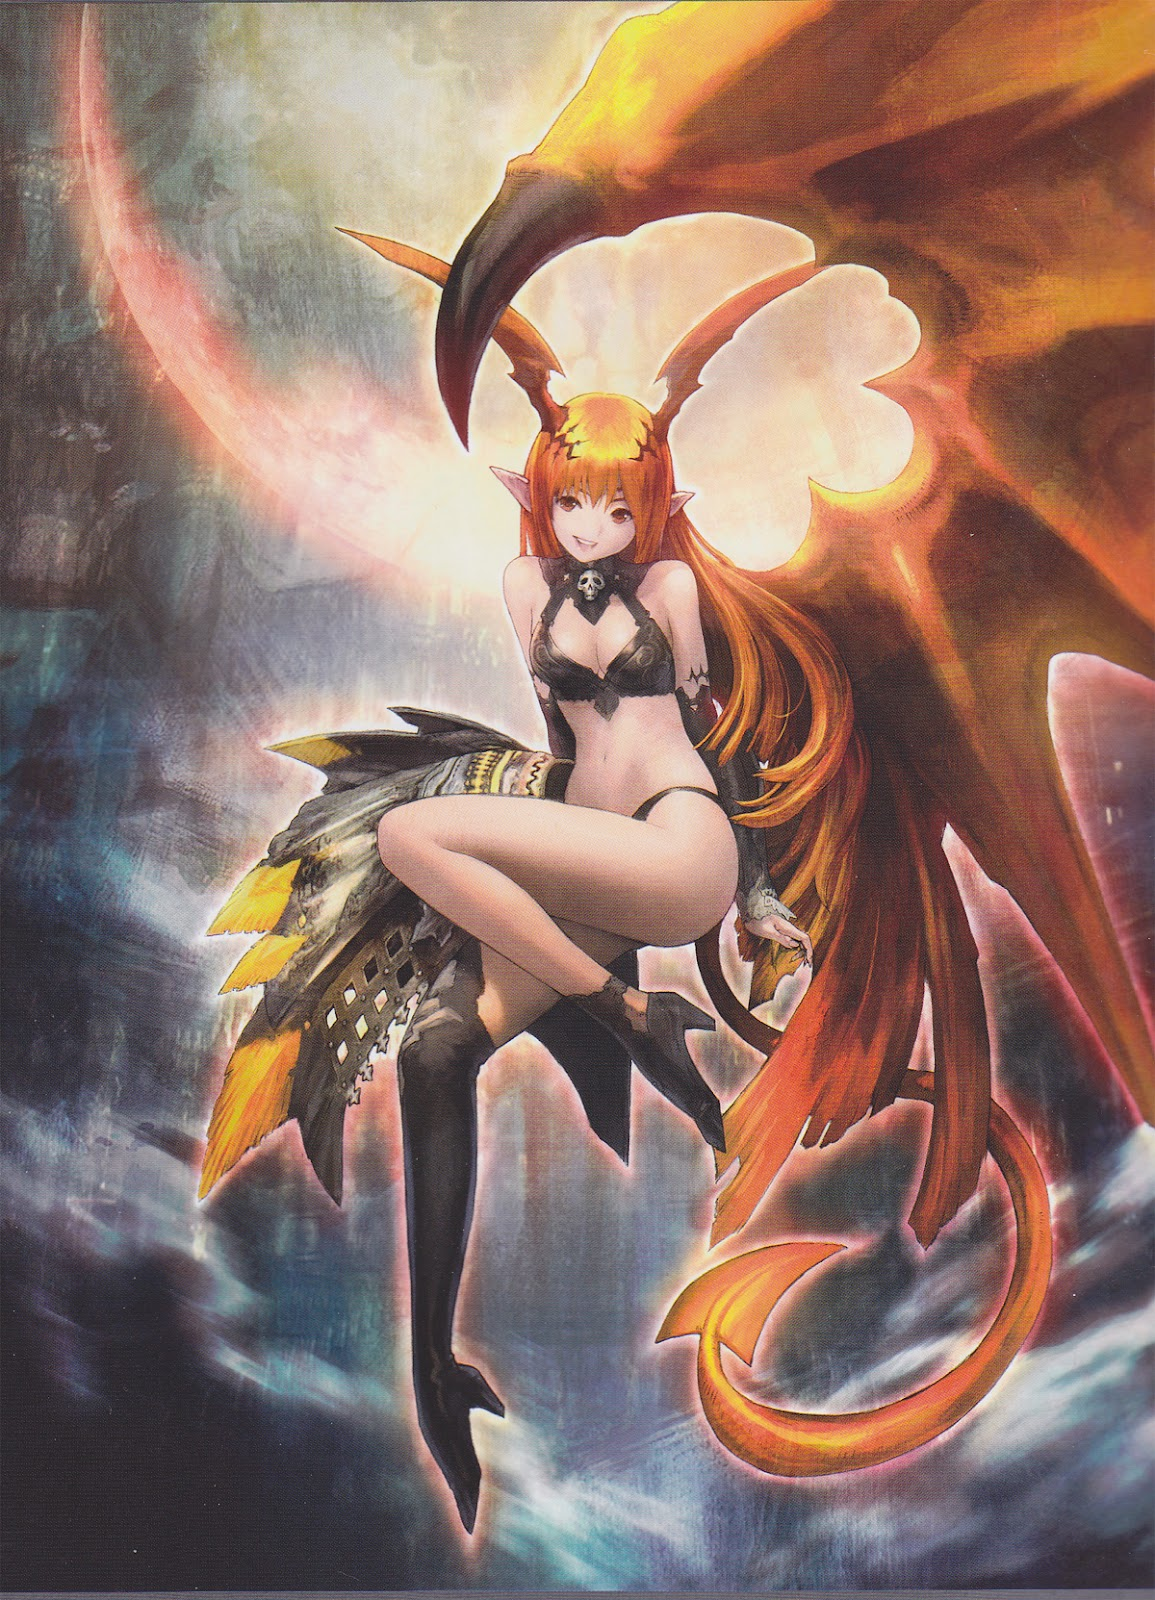 Miikos cosplay - Succubus (28/04/2012) | Cosplays Lovers